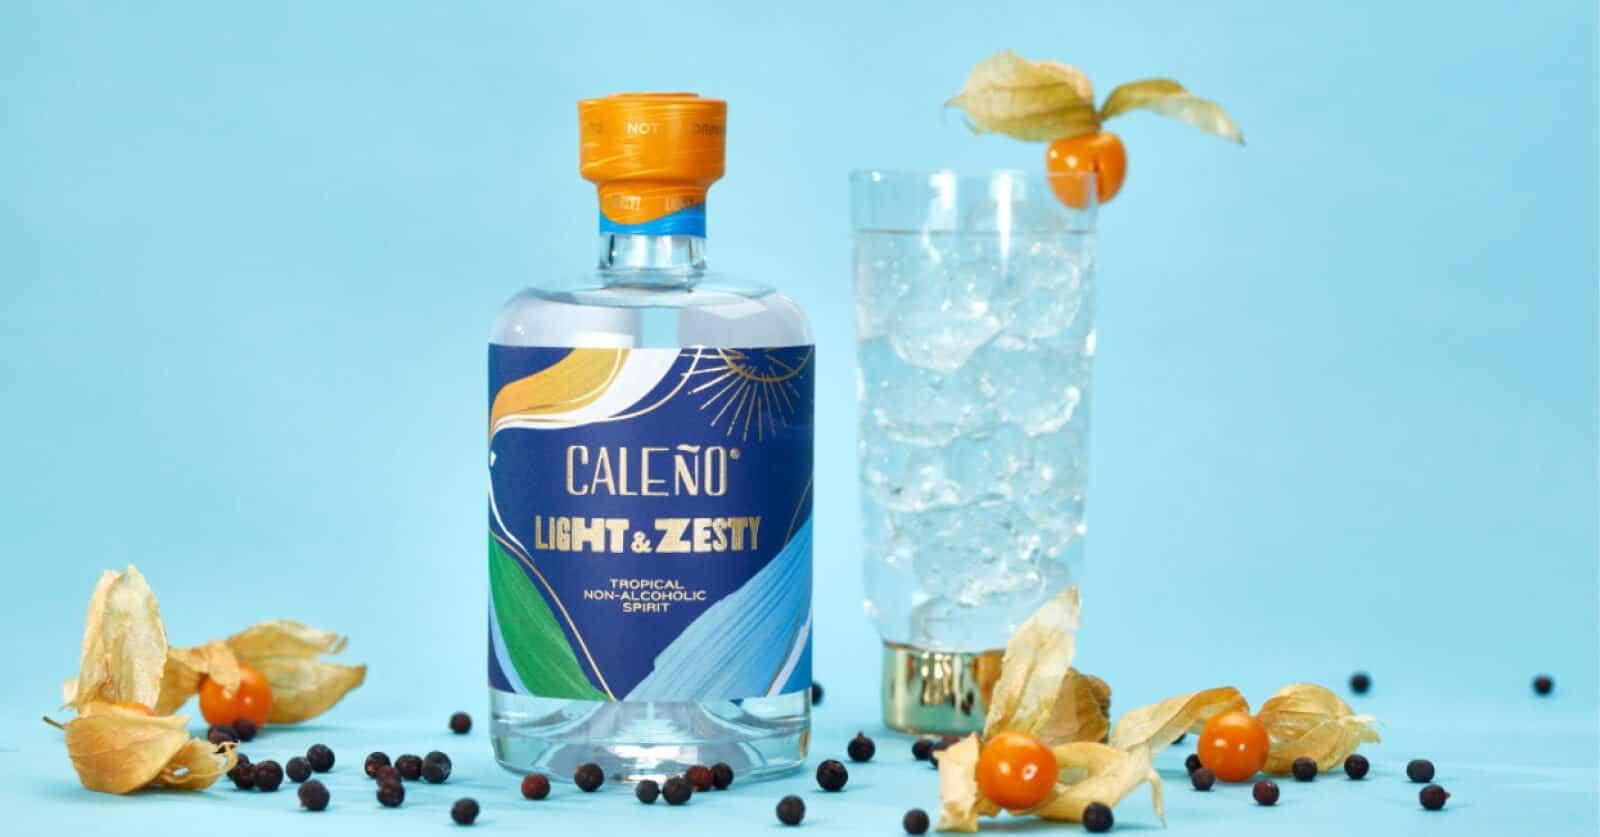 Caleno sustainable drinks brand